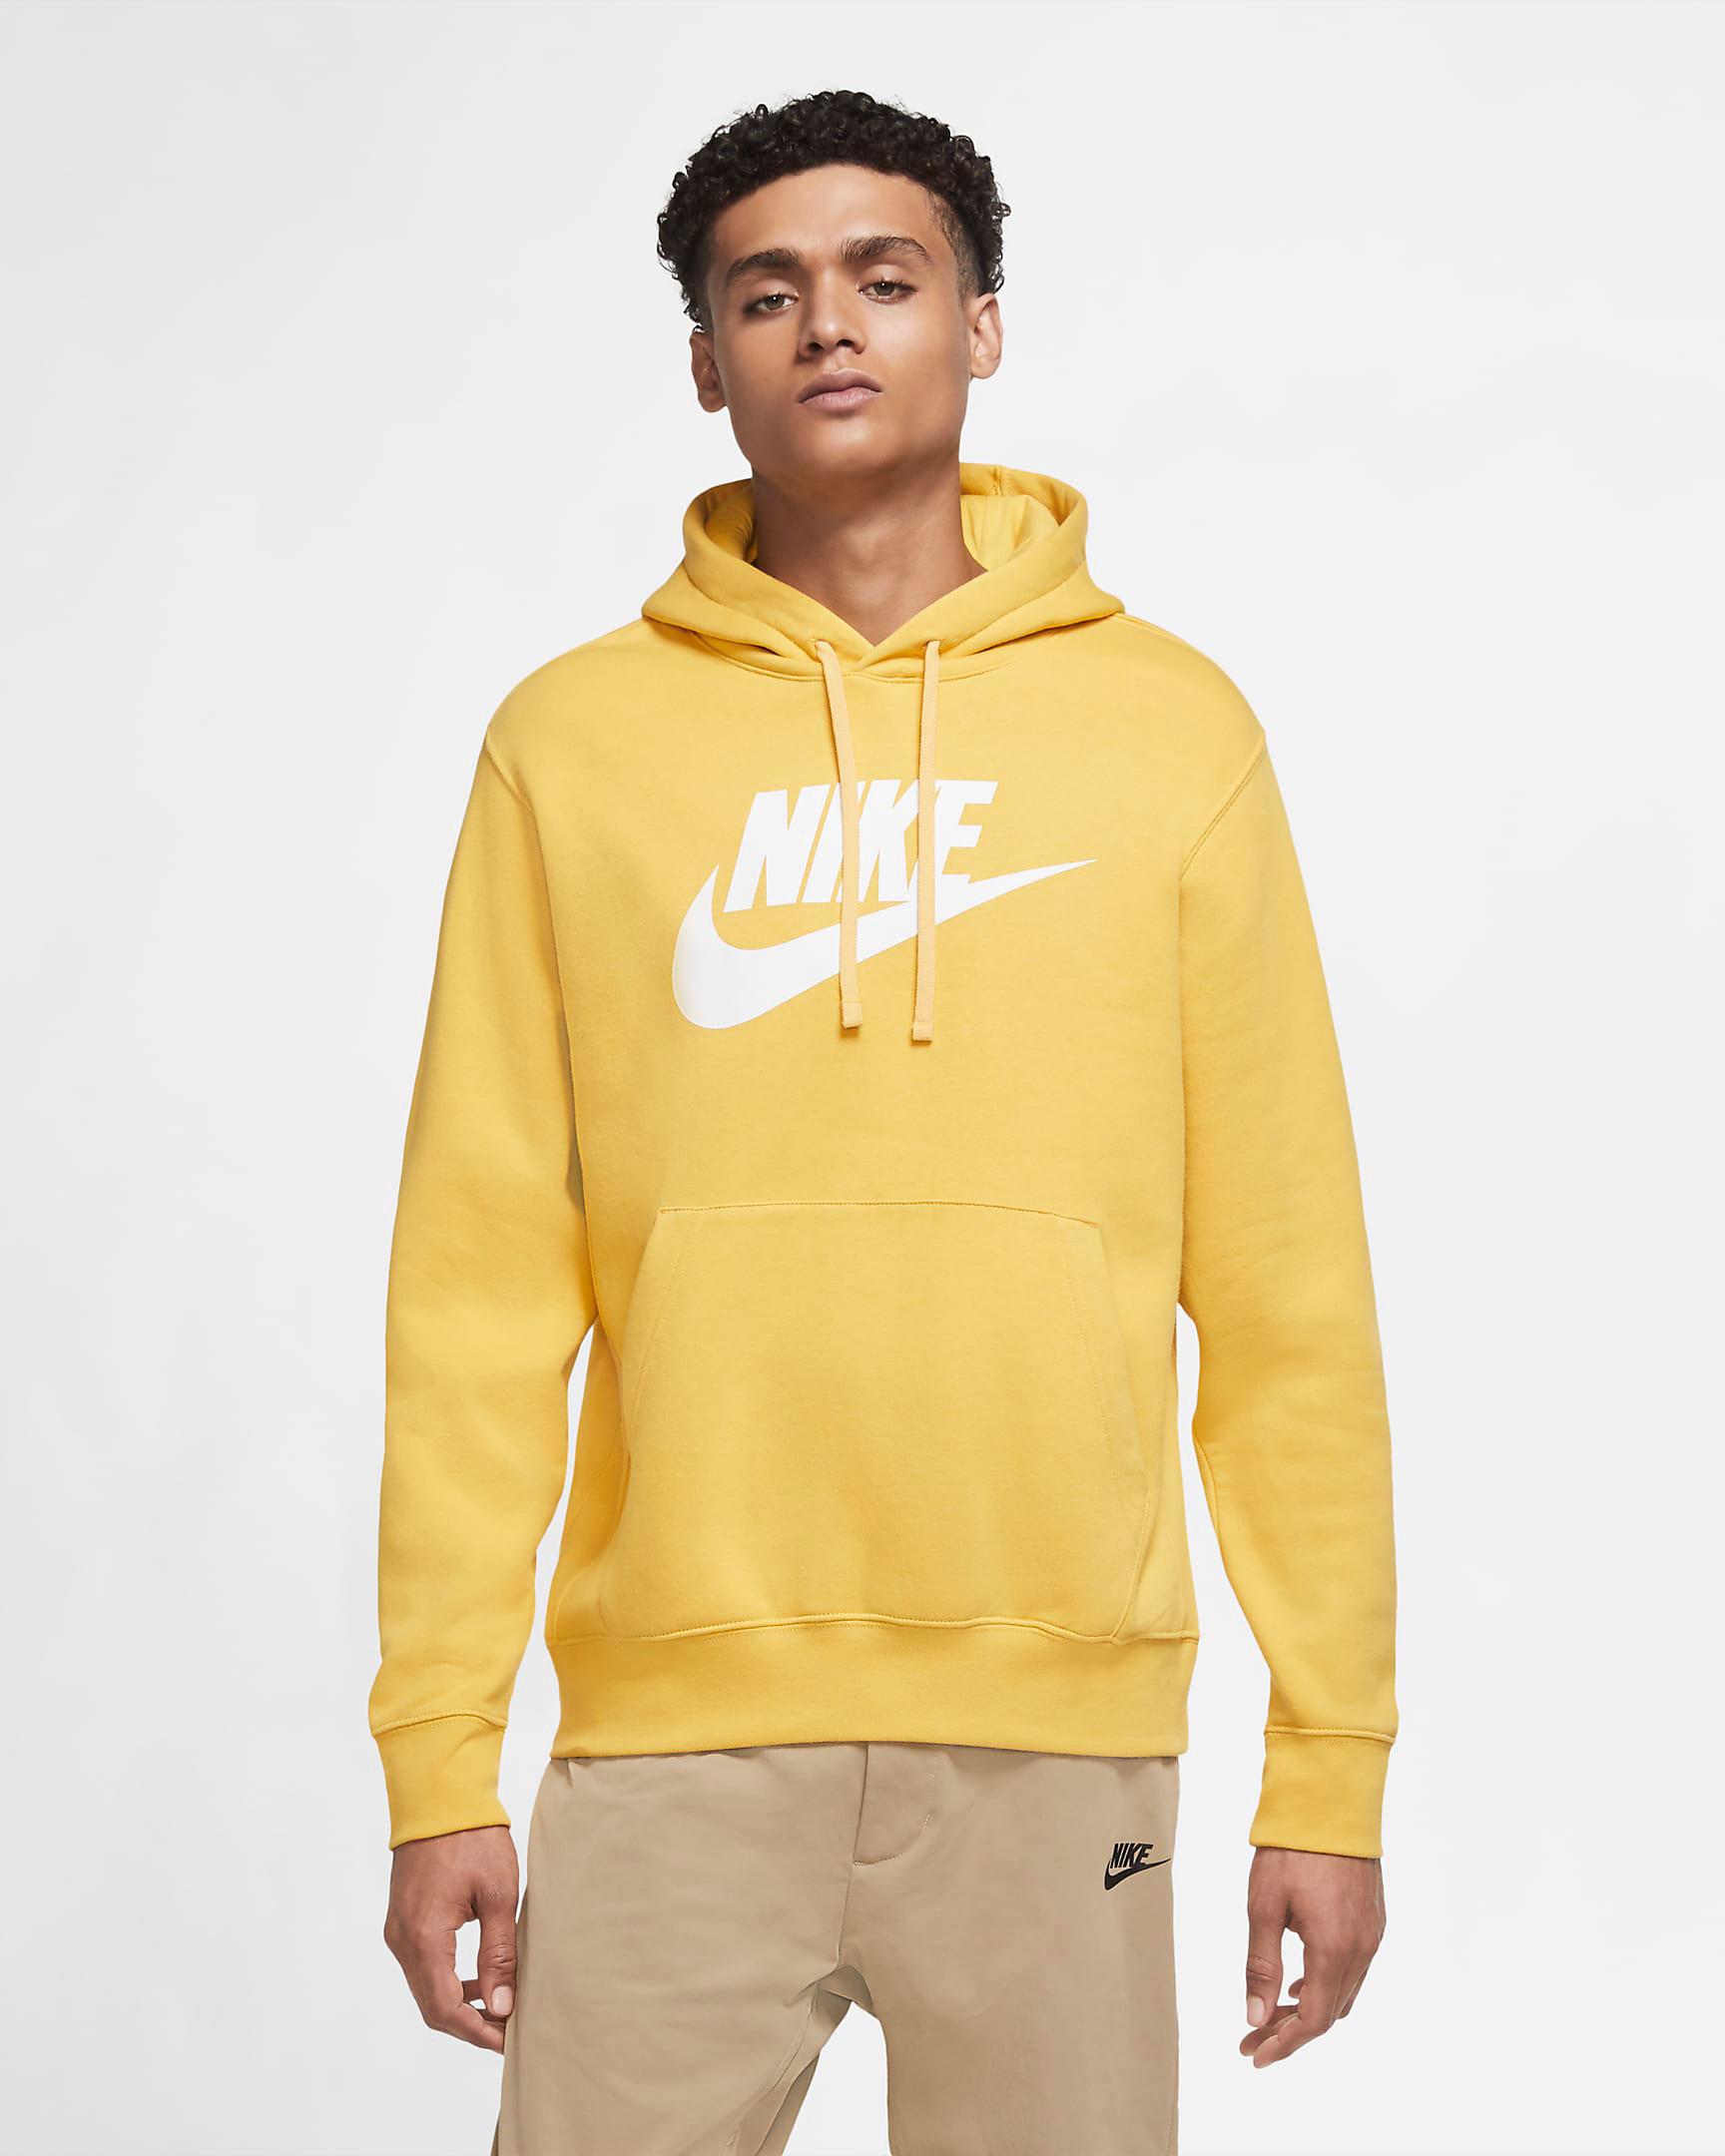 jordan-1-bio-hack-nike-hoodie-golden-yellow